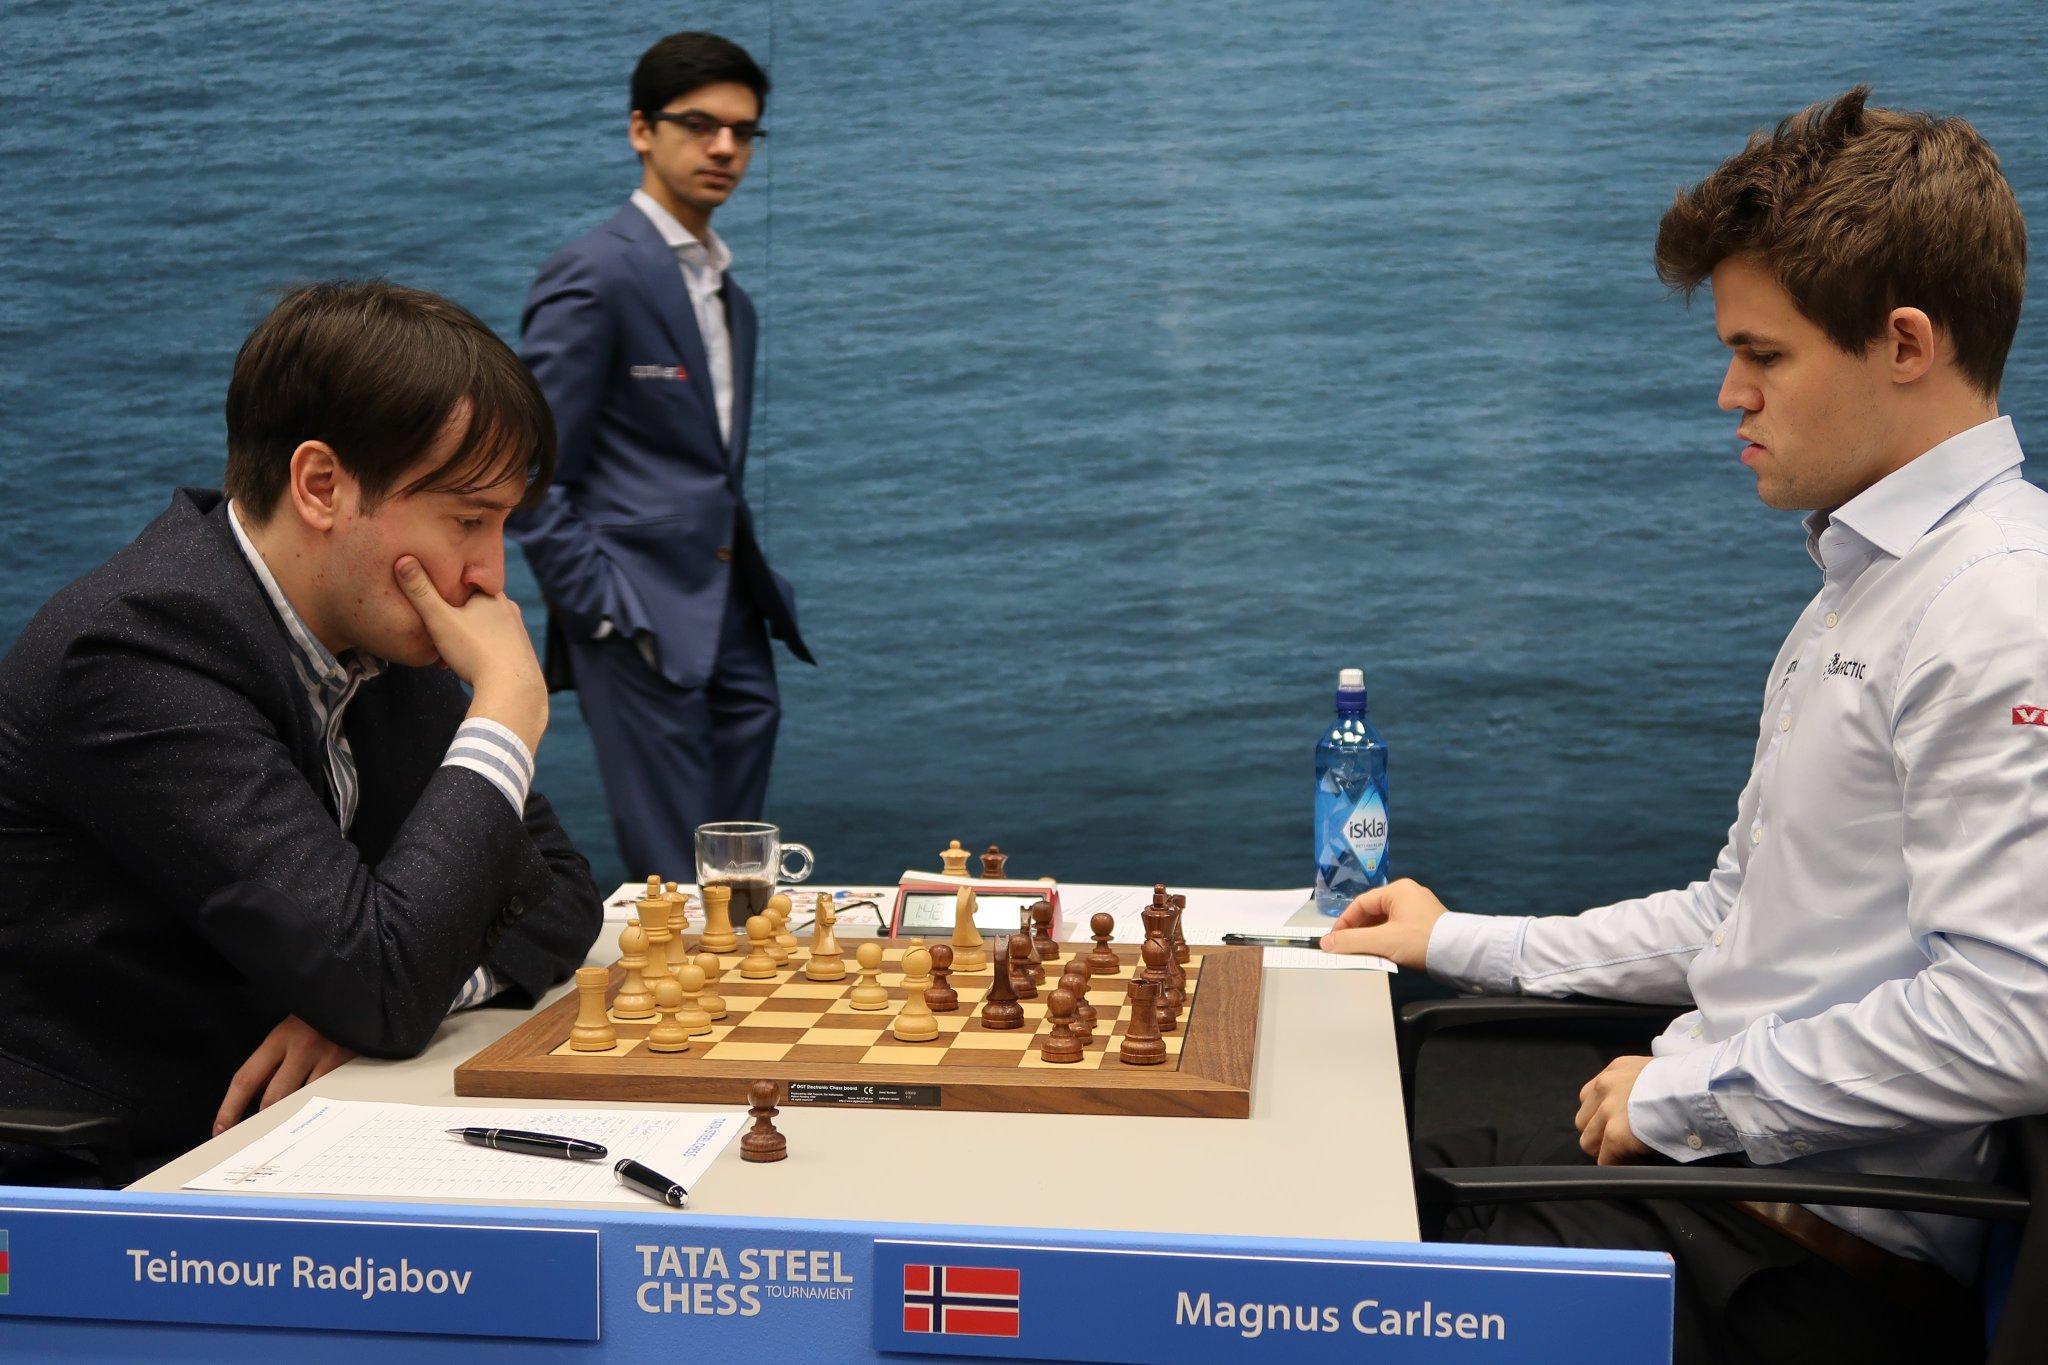 Tata-Steel-Chess-Masters-Carlsen-Giri-Radjabov-2019